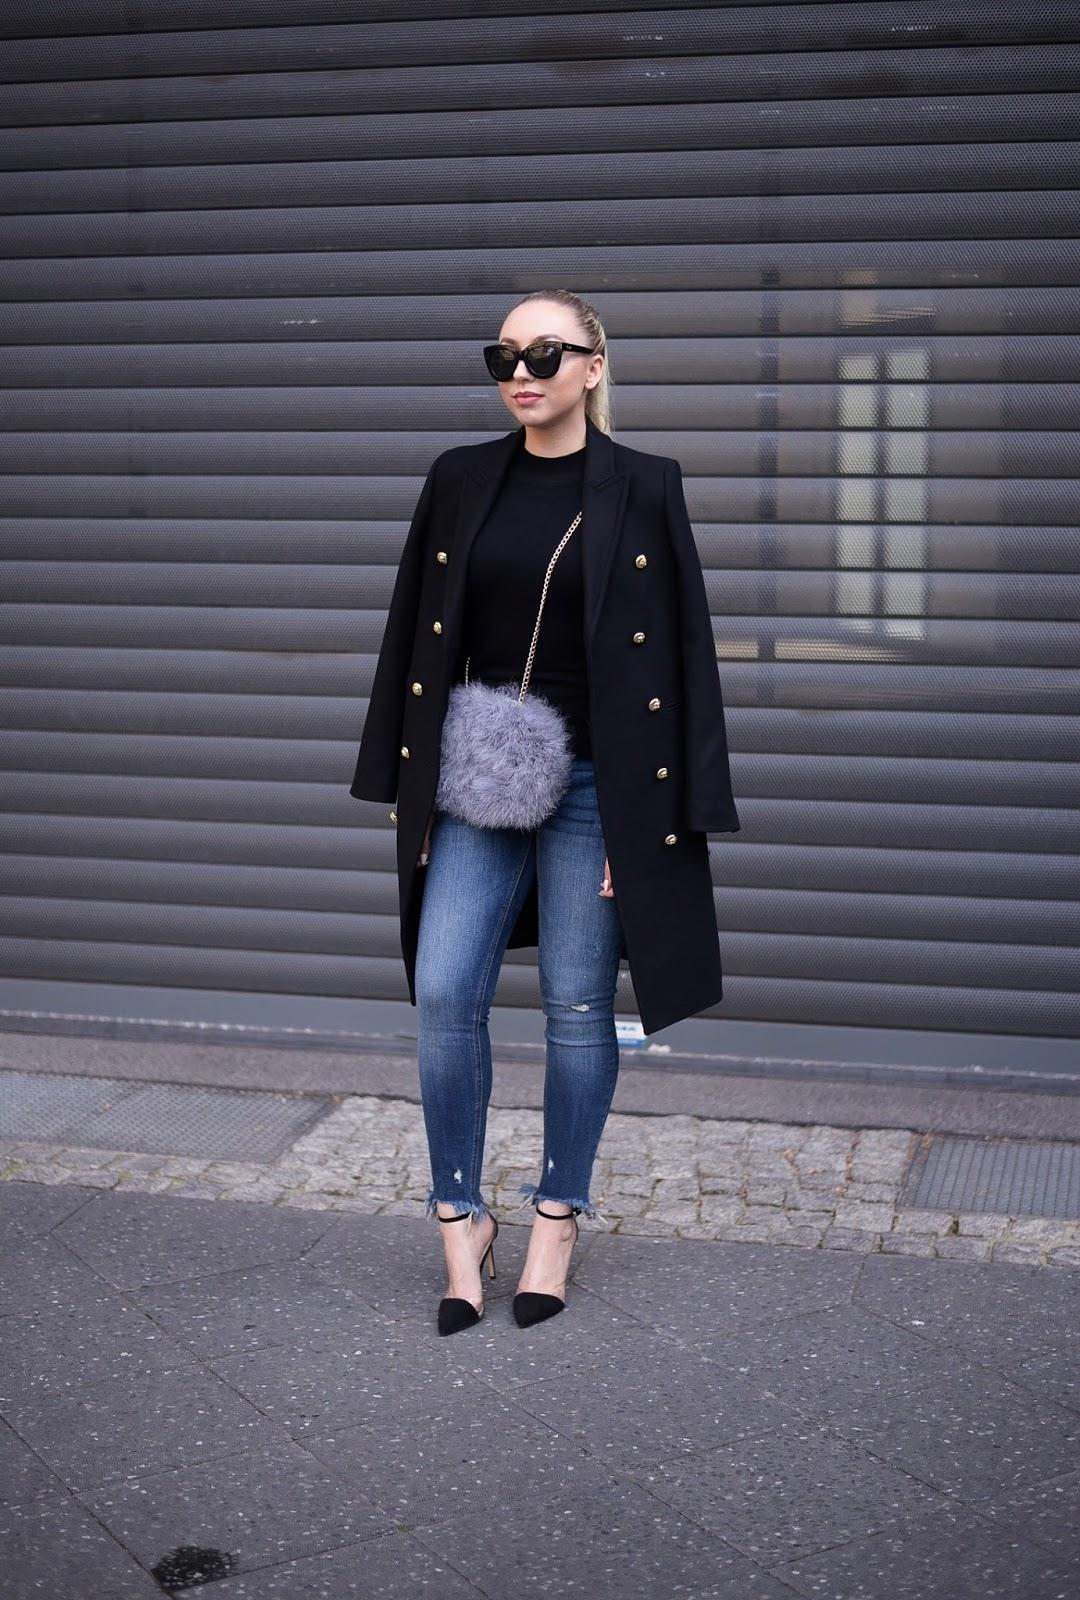 fashionblogger streetstyle 2016